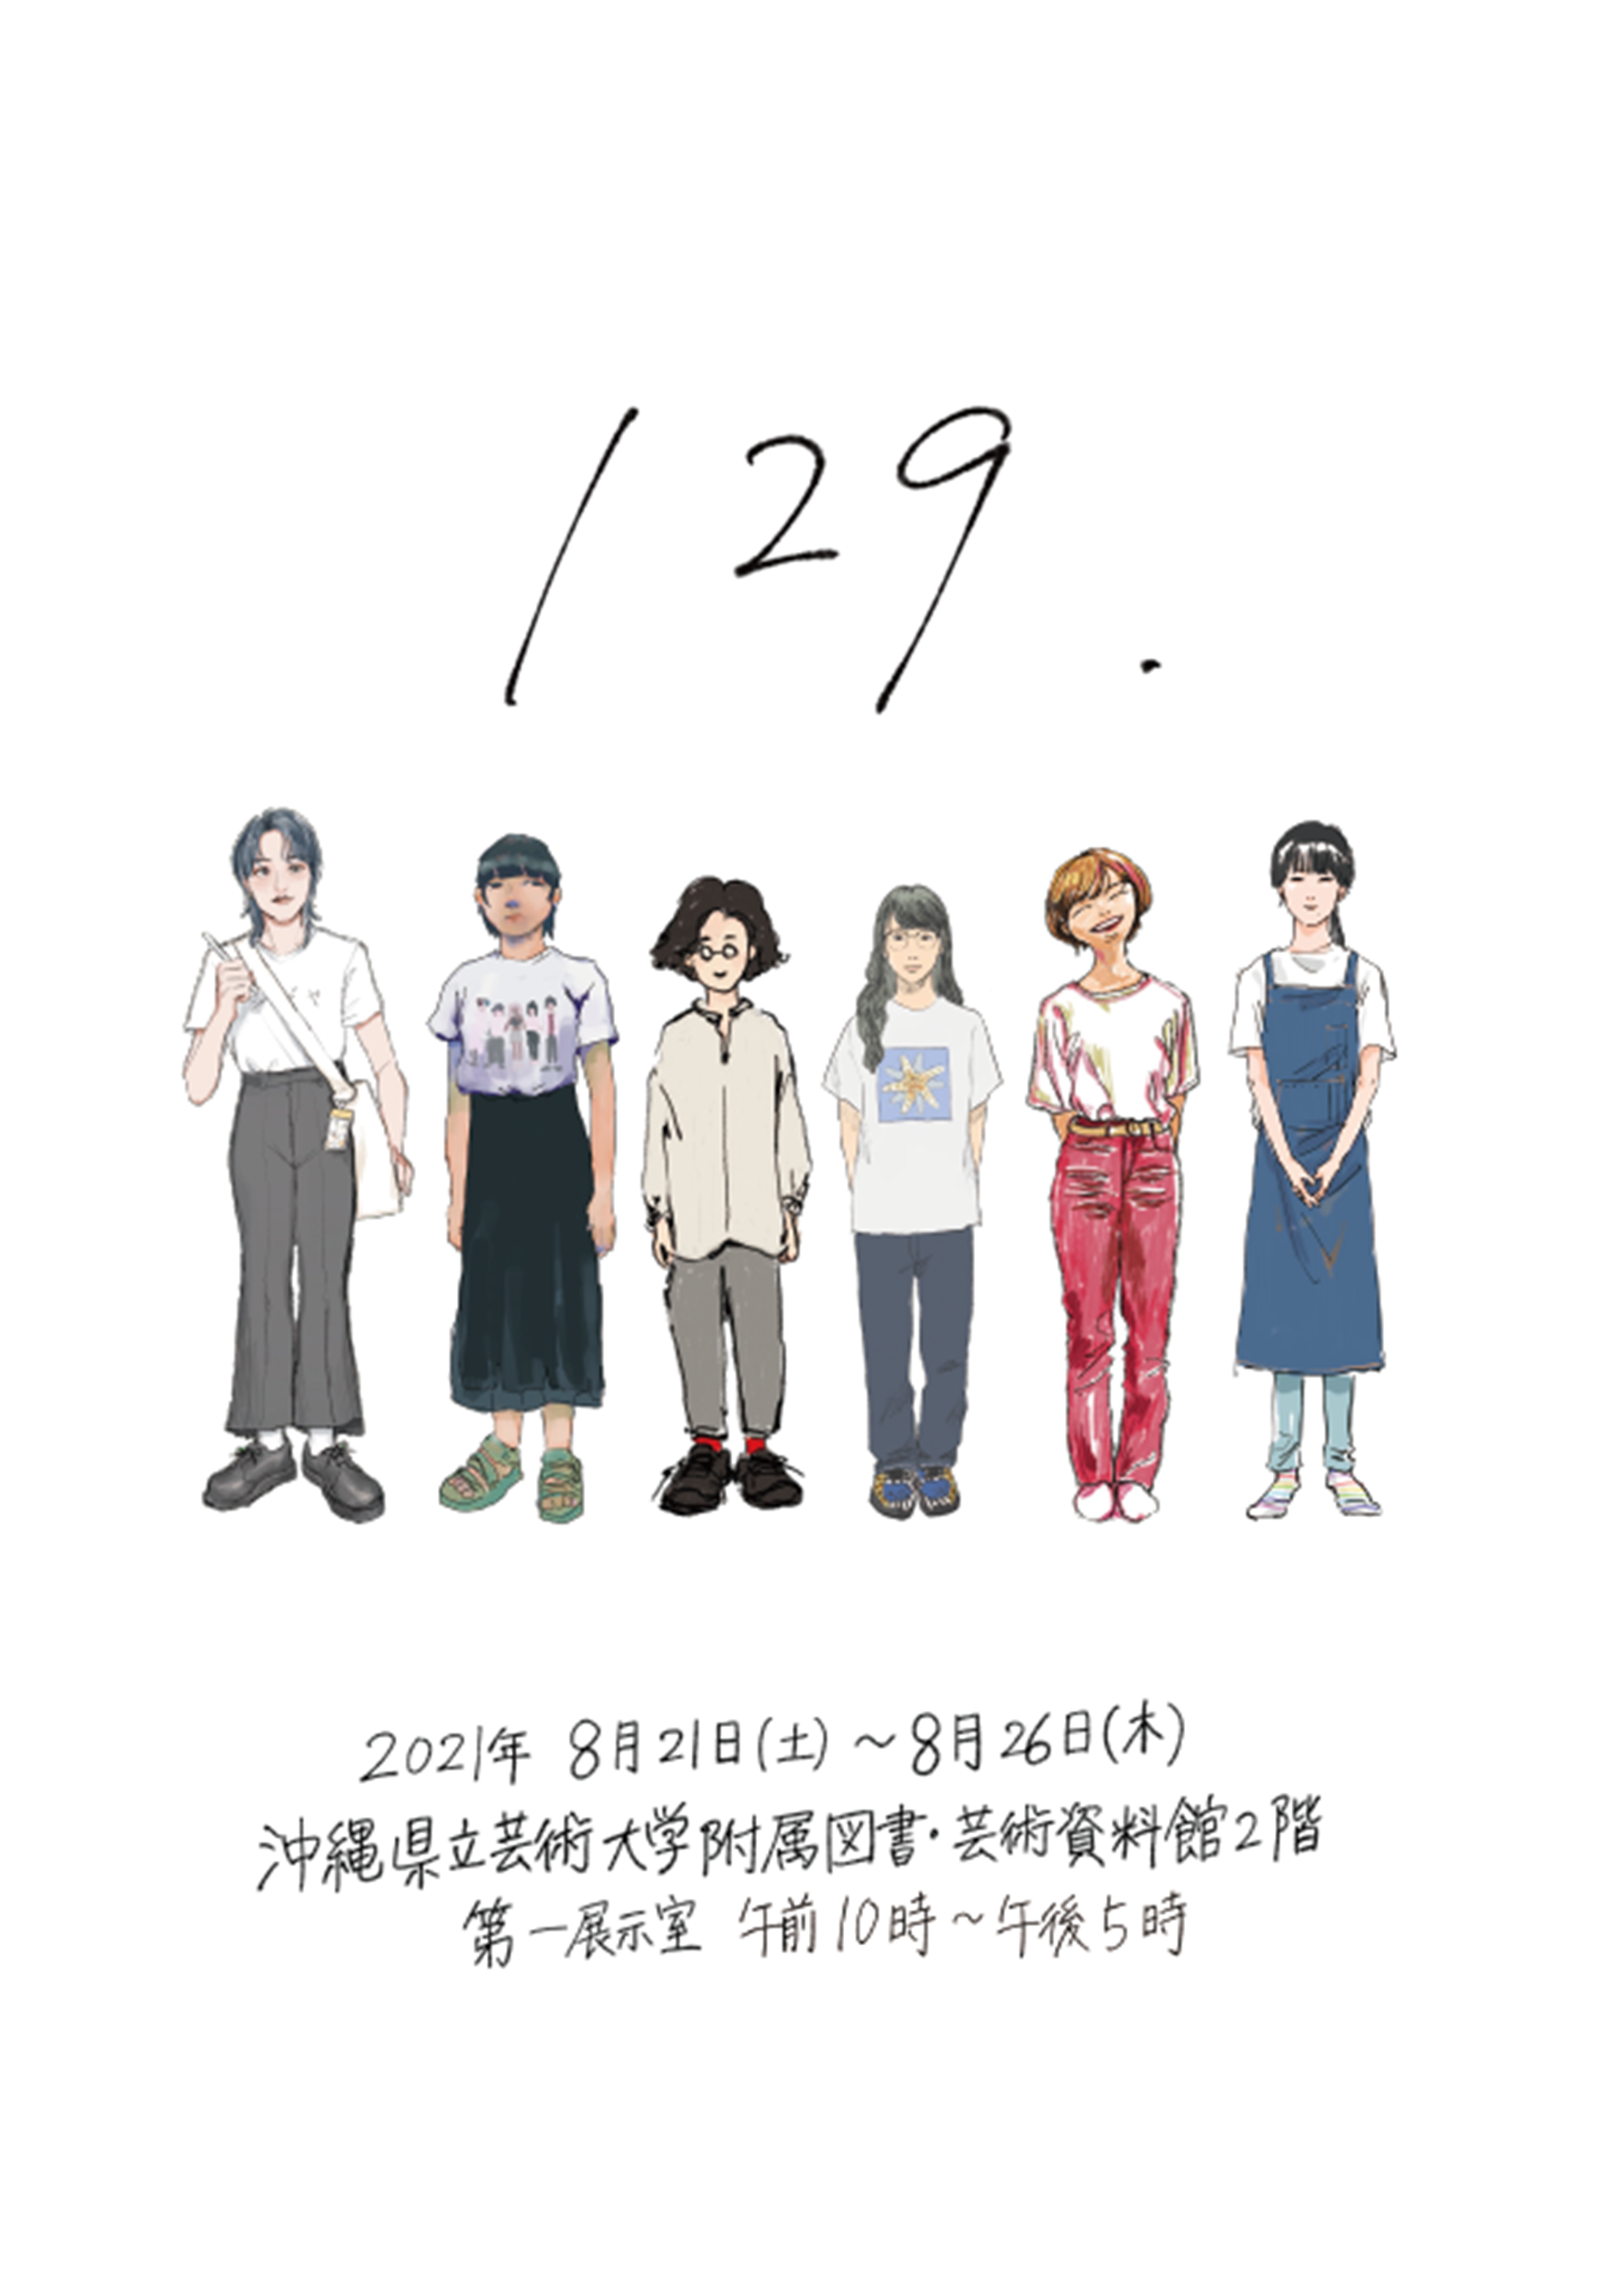 http://www.okigei.ac.jp/wp-content/uploads/2021/08/129.png